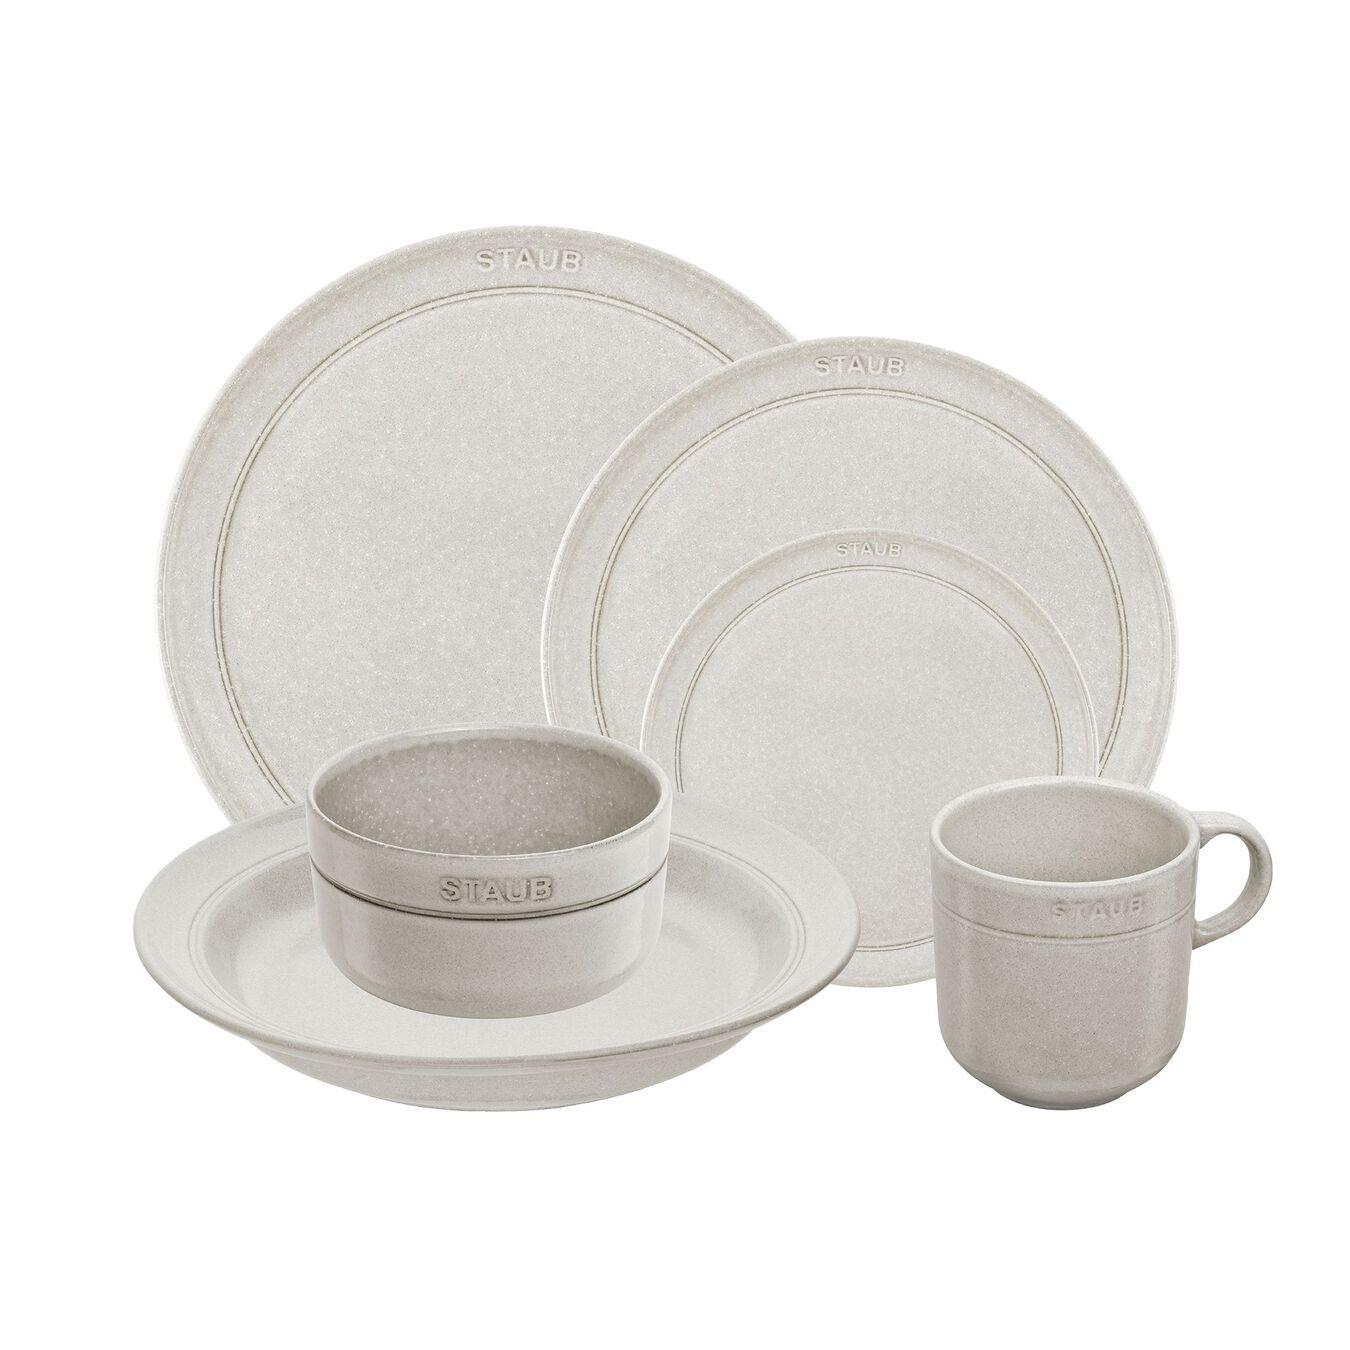 Serving set, 72 Piece   white truffle   ceramic,,large 1